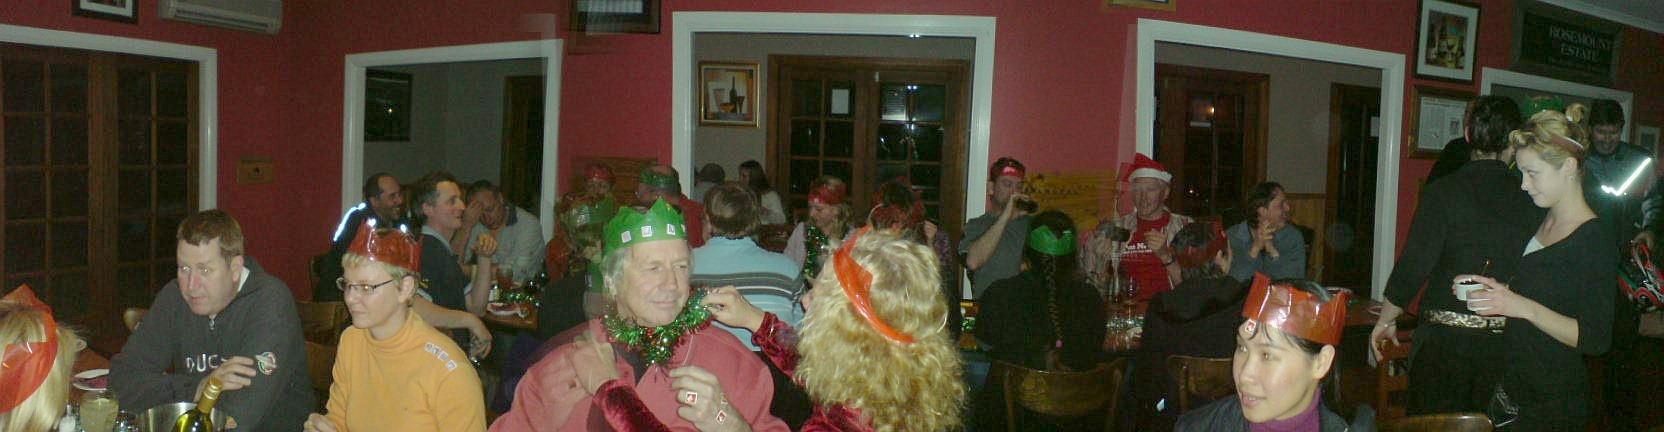 Christmas in July '07 - Denman